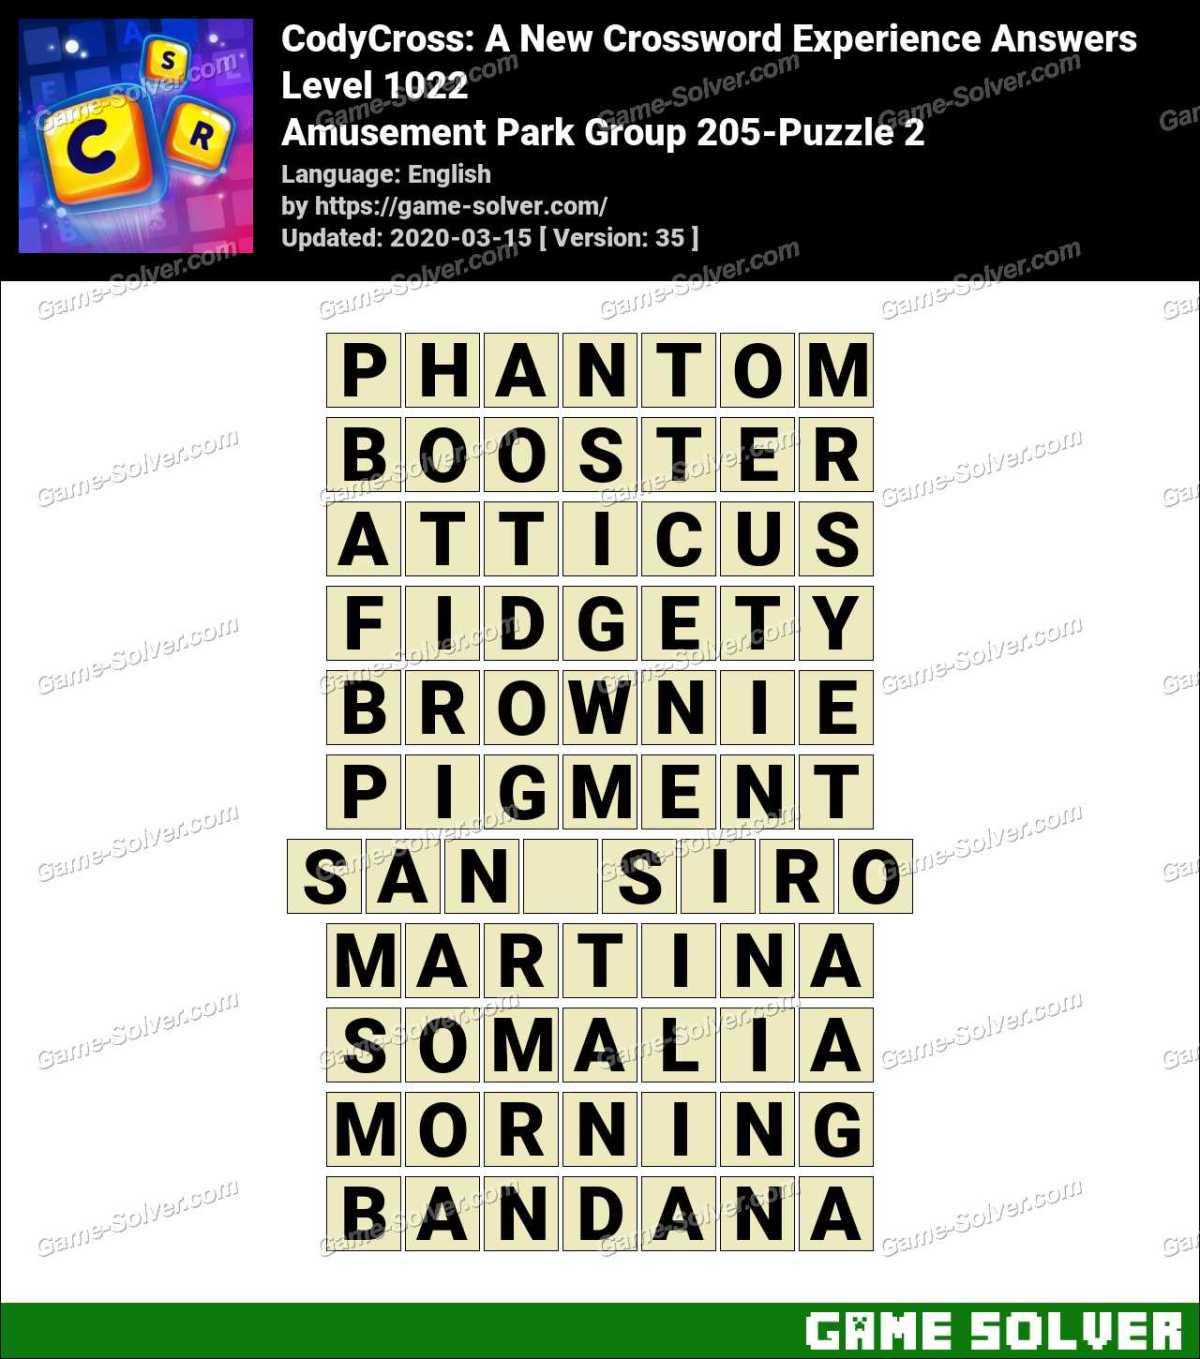 CodyCross Amusement Park Group 205-Puzzle 2 Answers